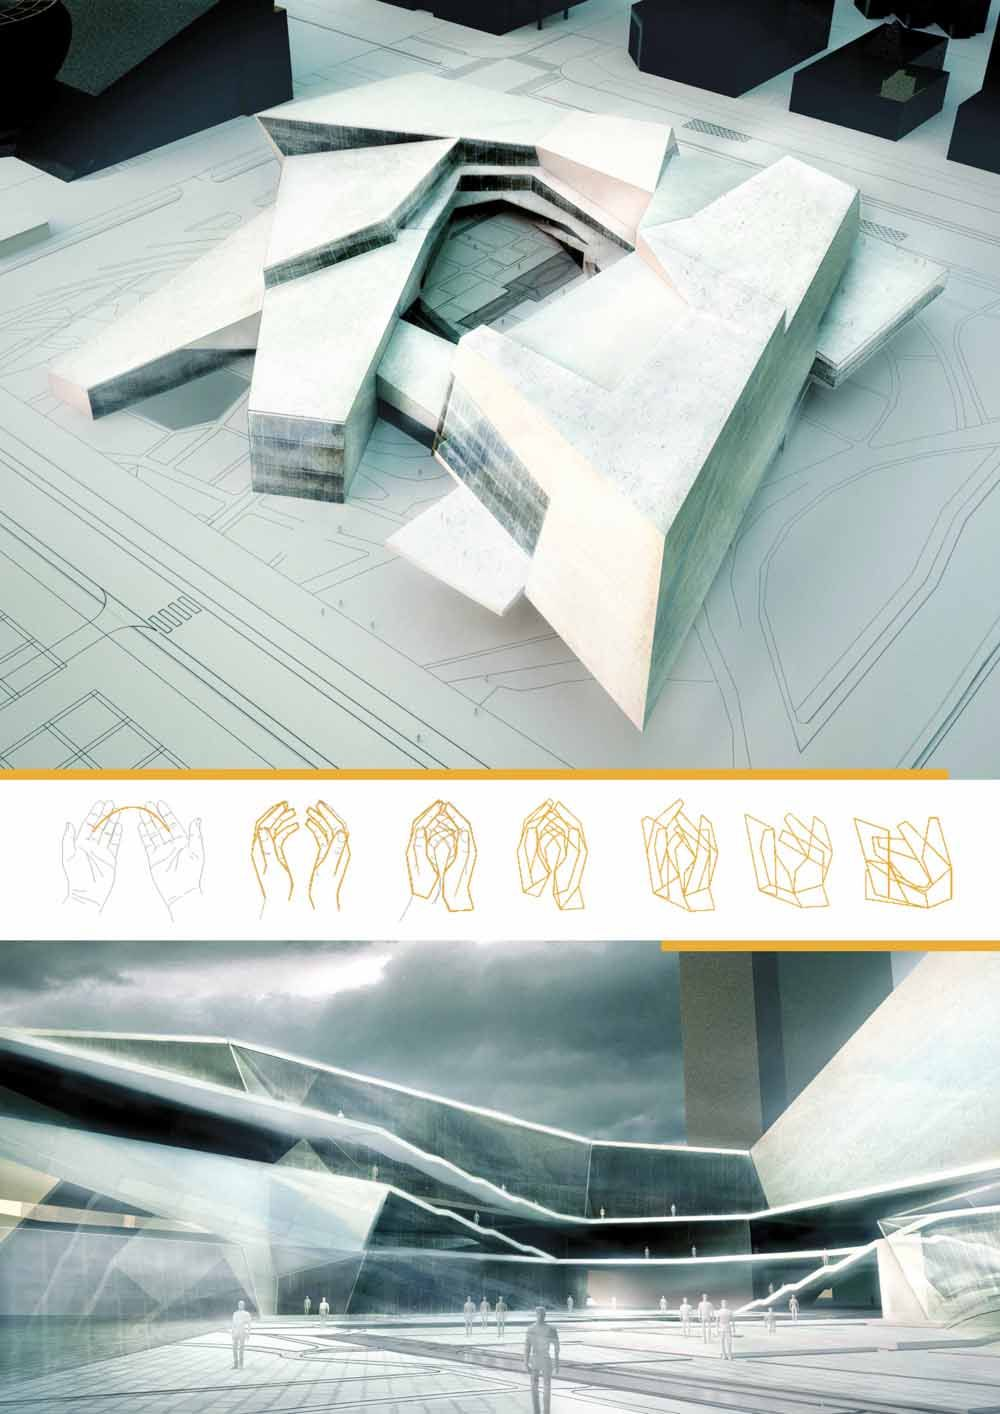 Village architecture buscar con google laminas de for Arquitectura parametrica pdf